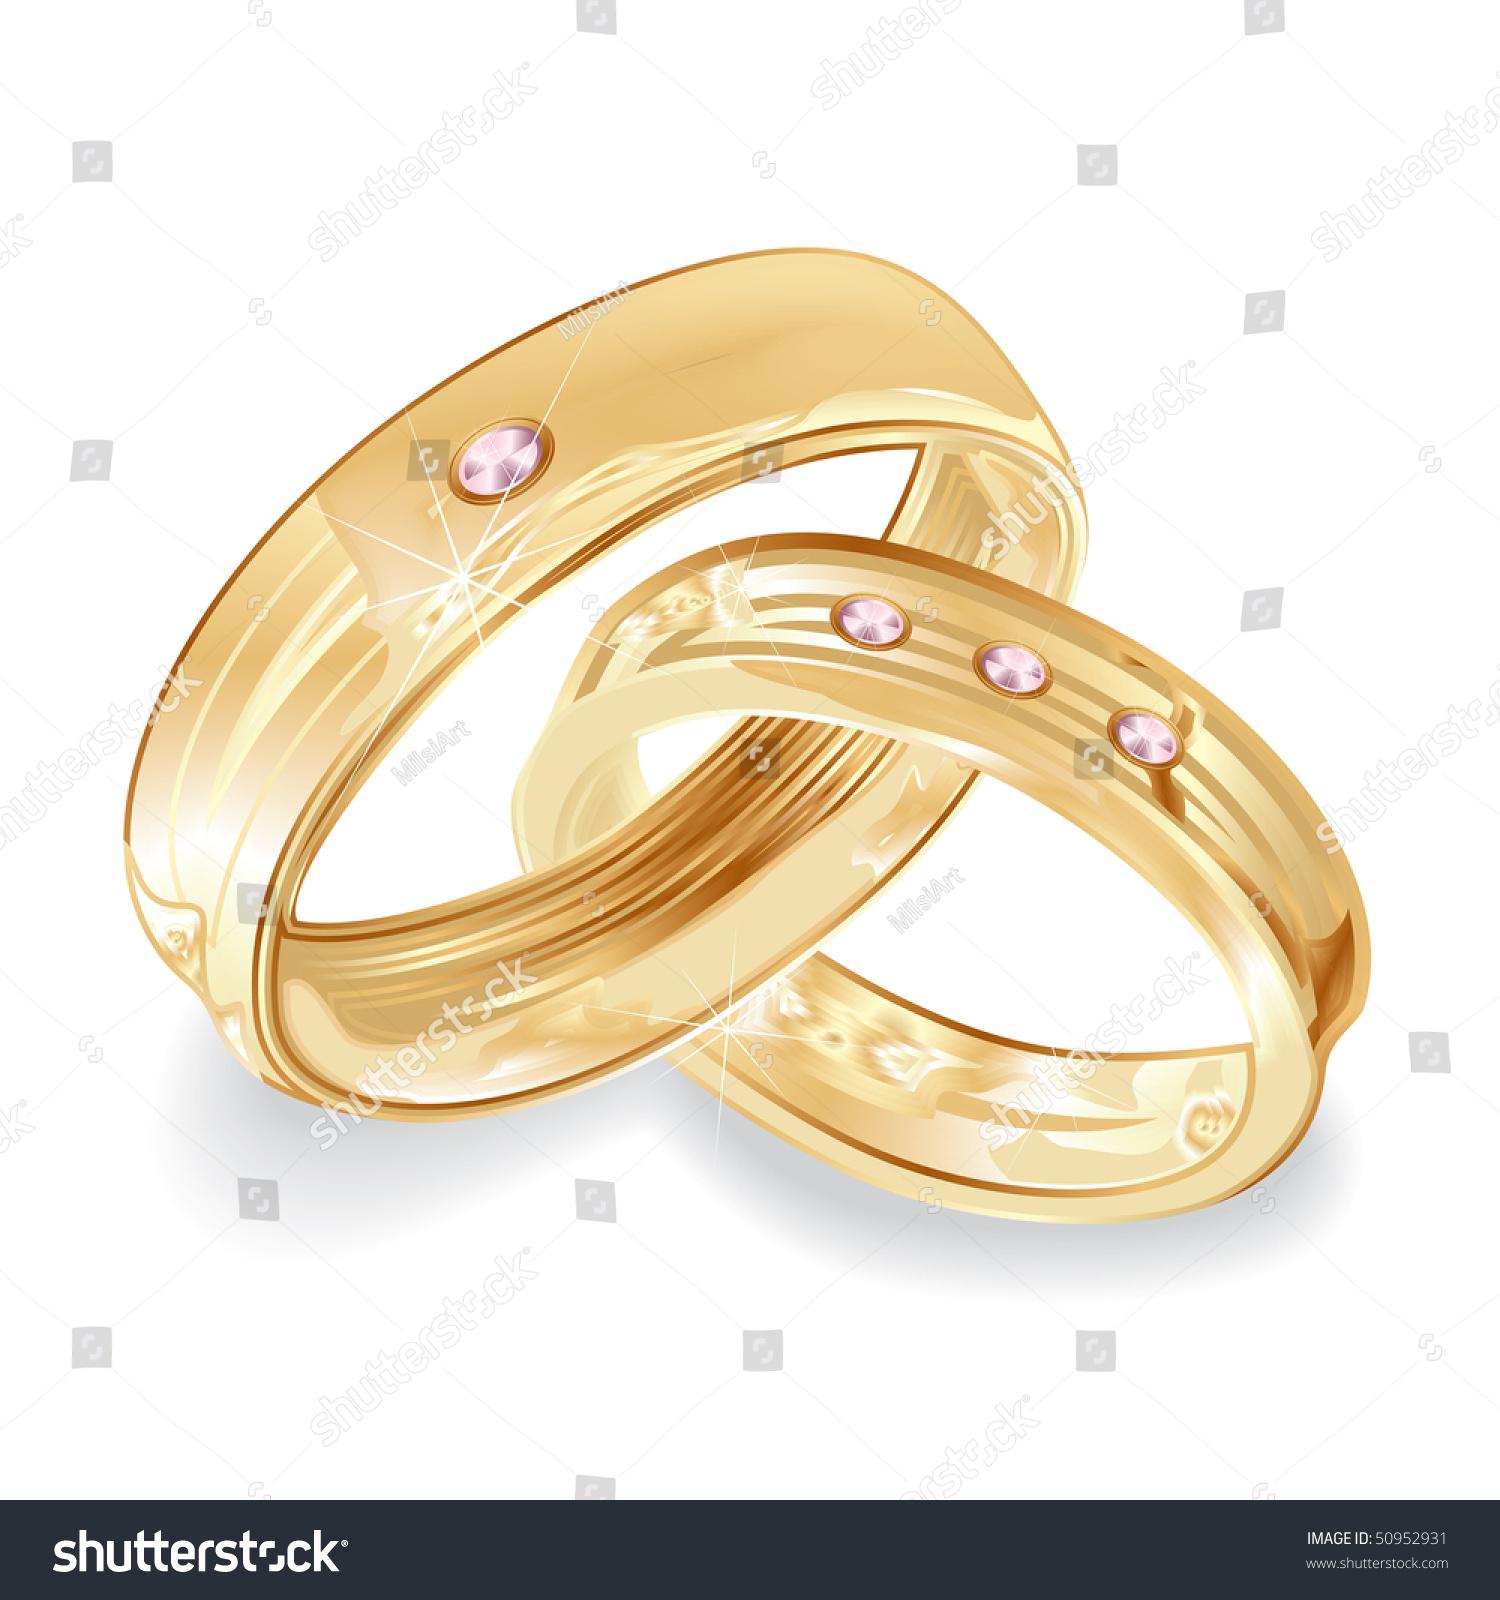 Female Male Gold Wedding Rings Illustration Stock Illustration